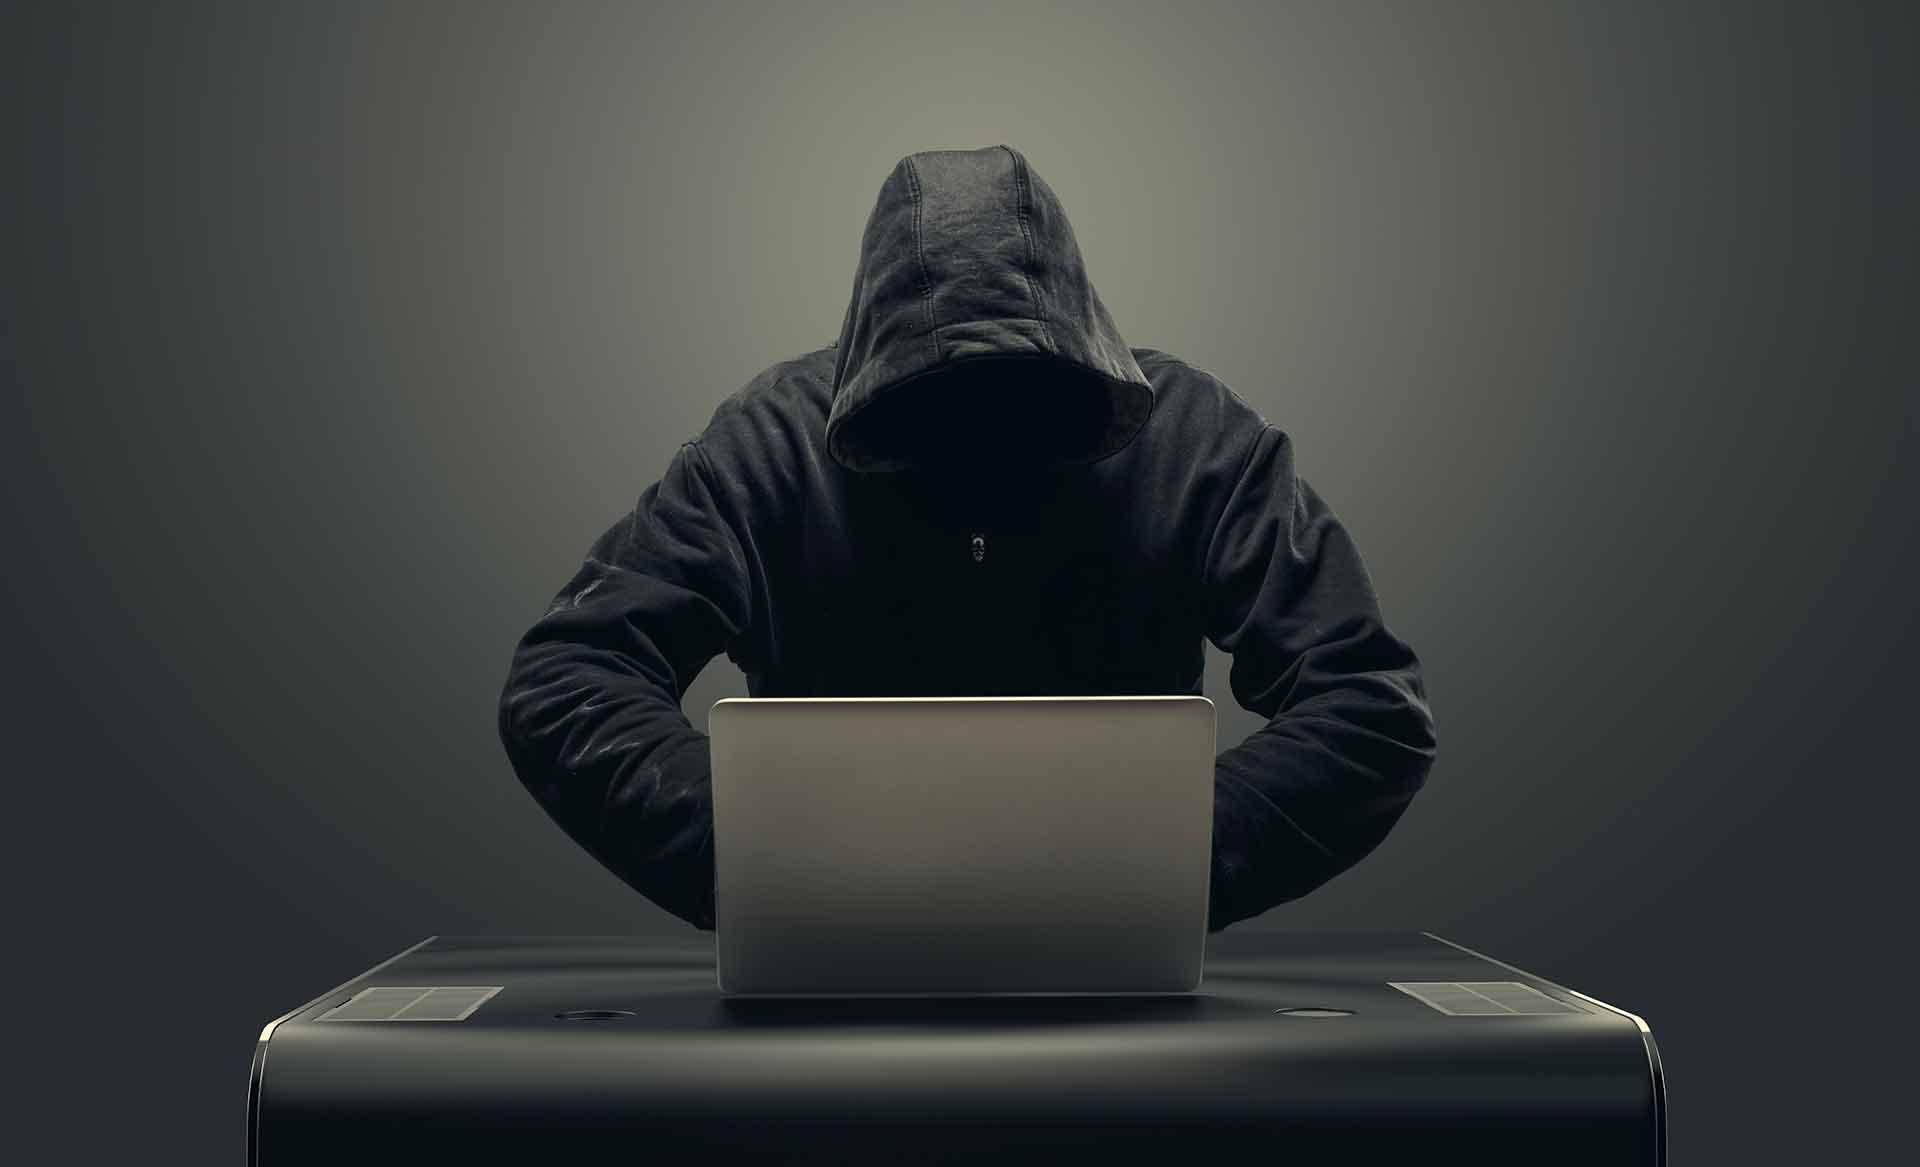 Computerfraude strafrecht advocaat - Weening Strafrechtadvocaten